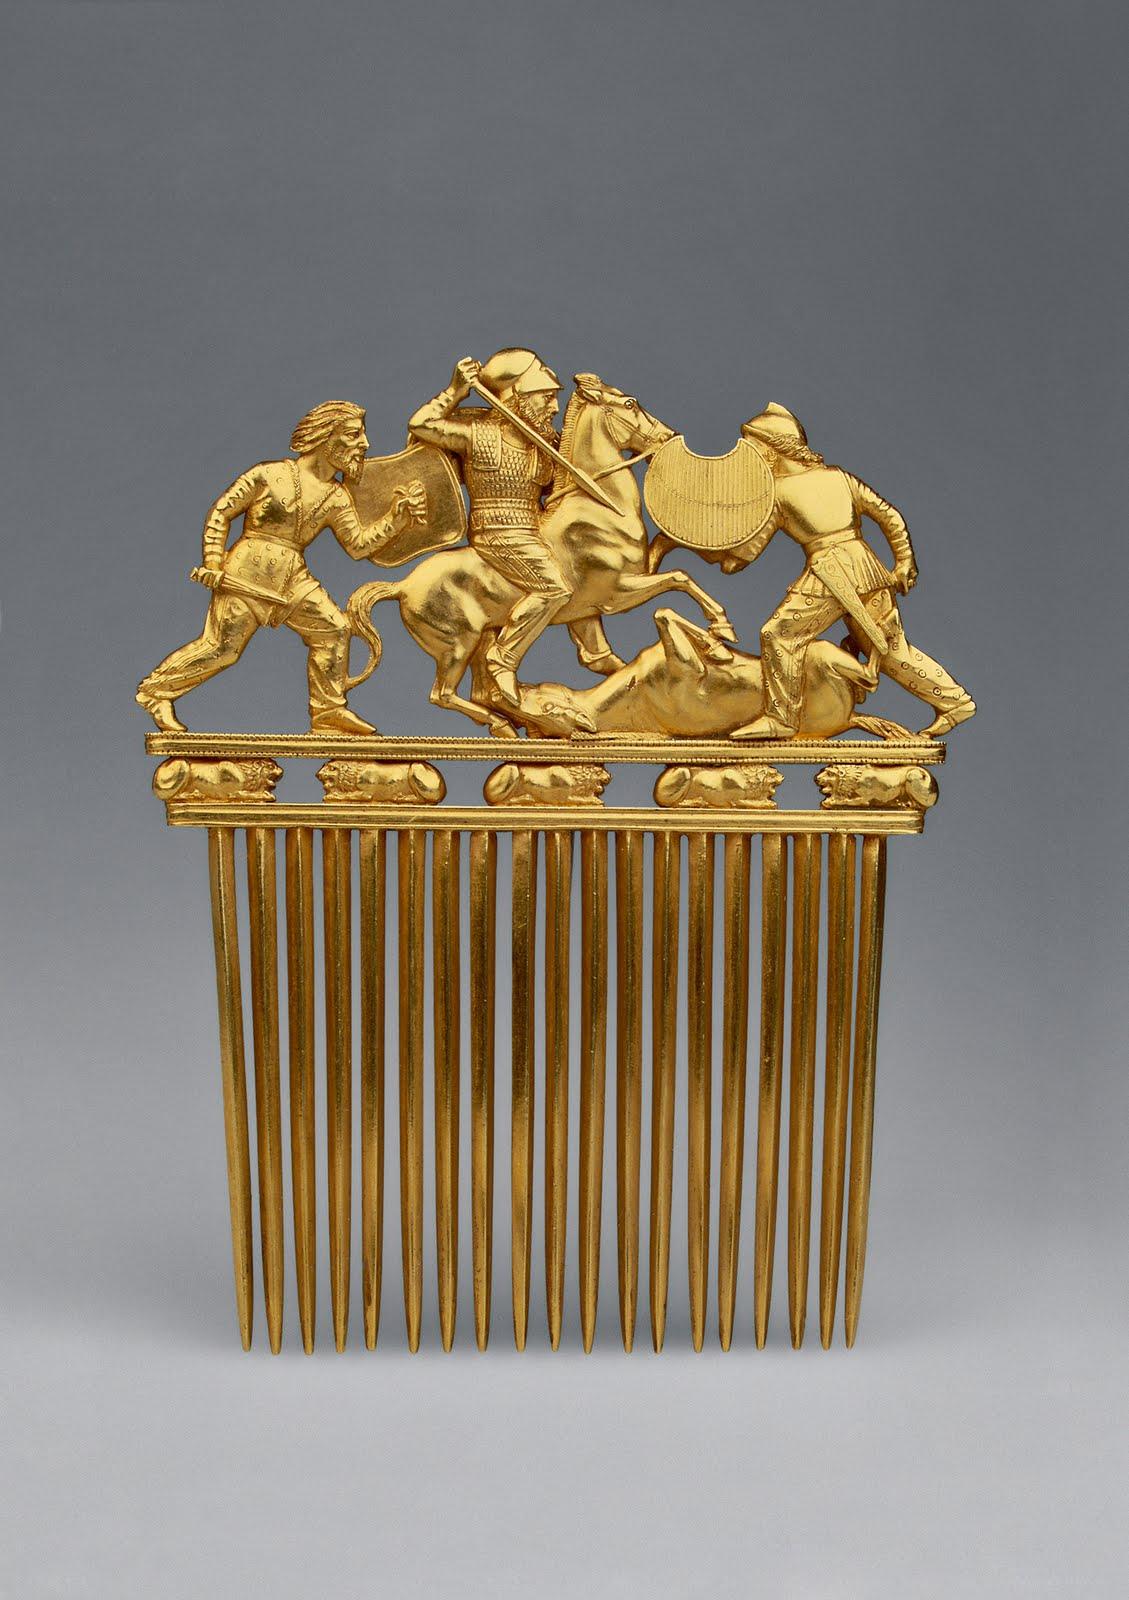 Scythian golden comb (5th century BC)